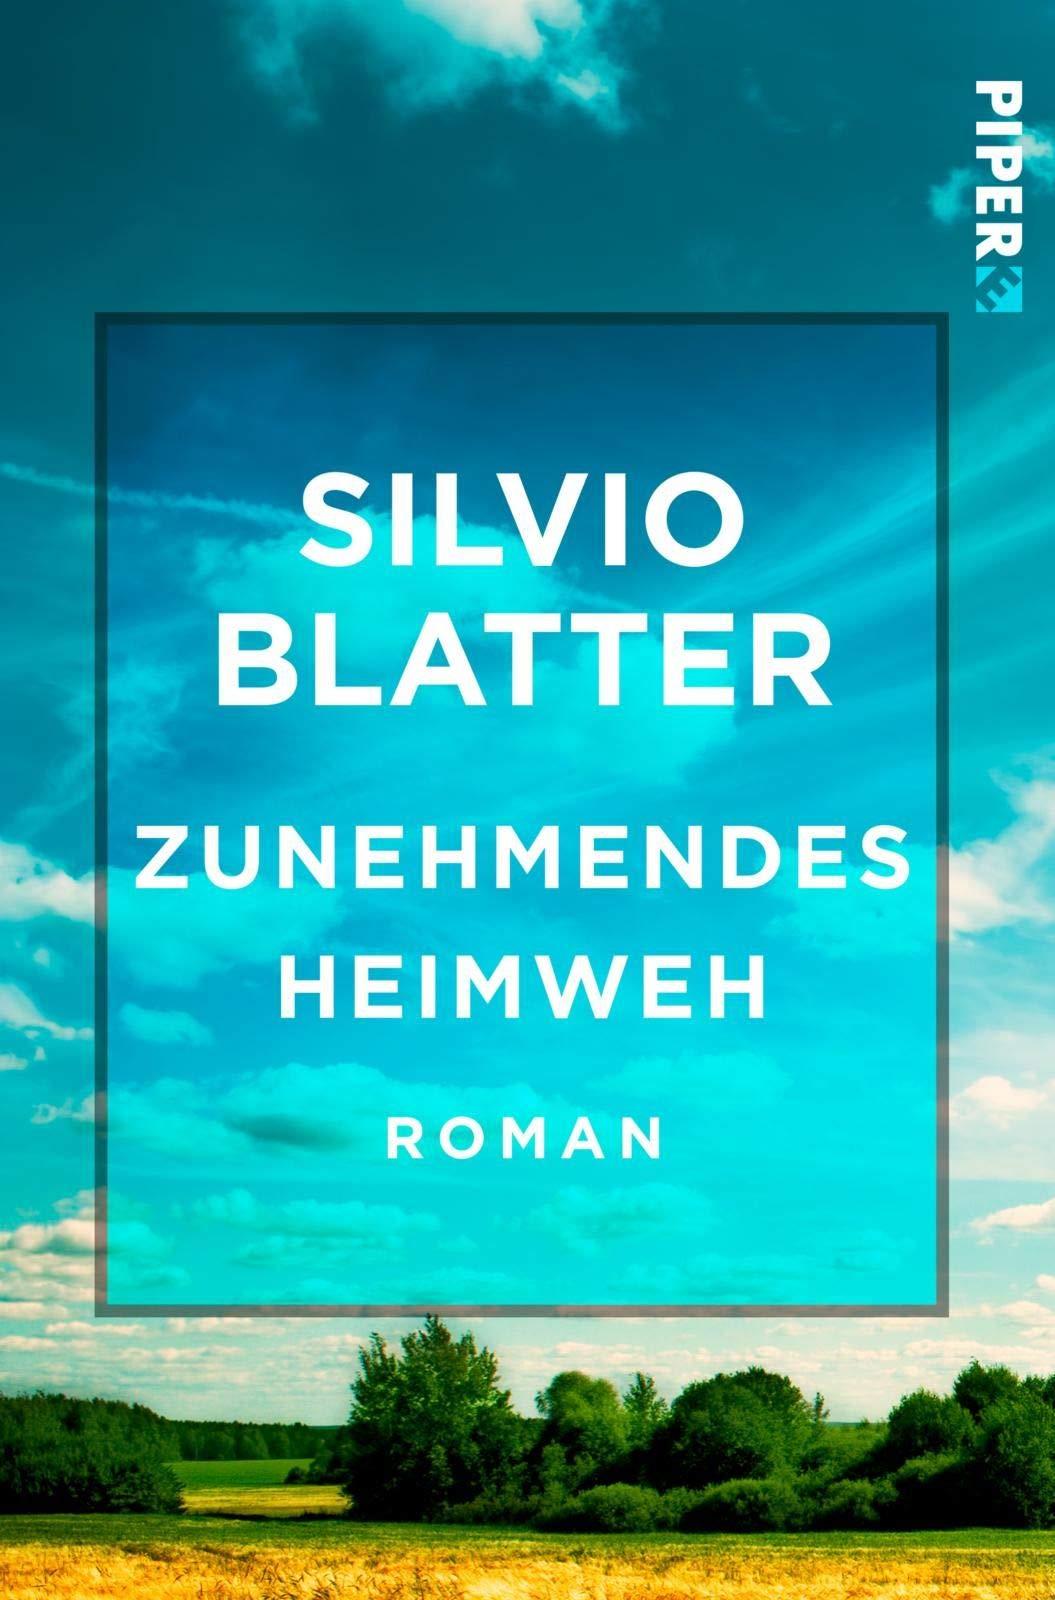 Zunehmendes Heimweh Freiamt Trilogie 1 Roman Amazon De Blatter Silvio Bucher